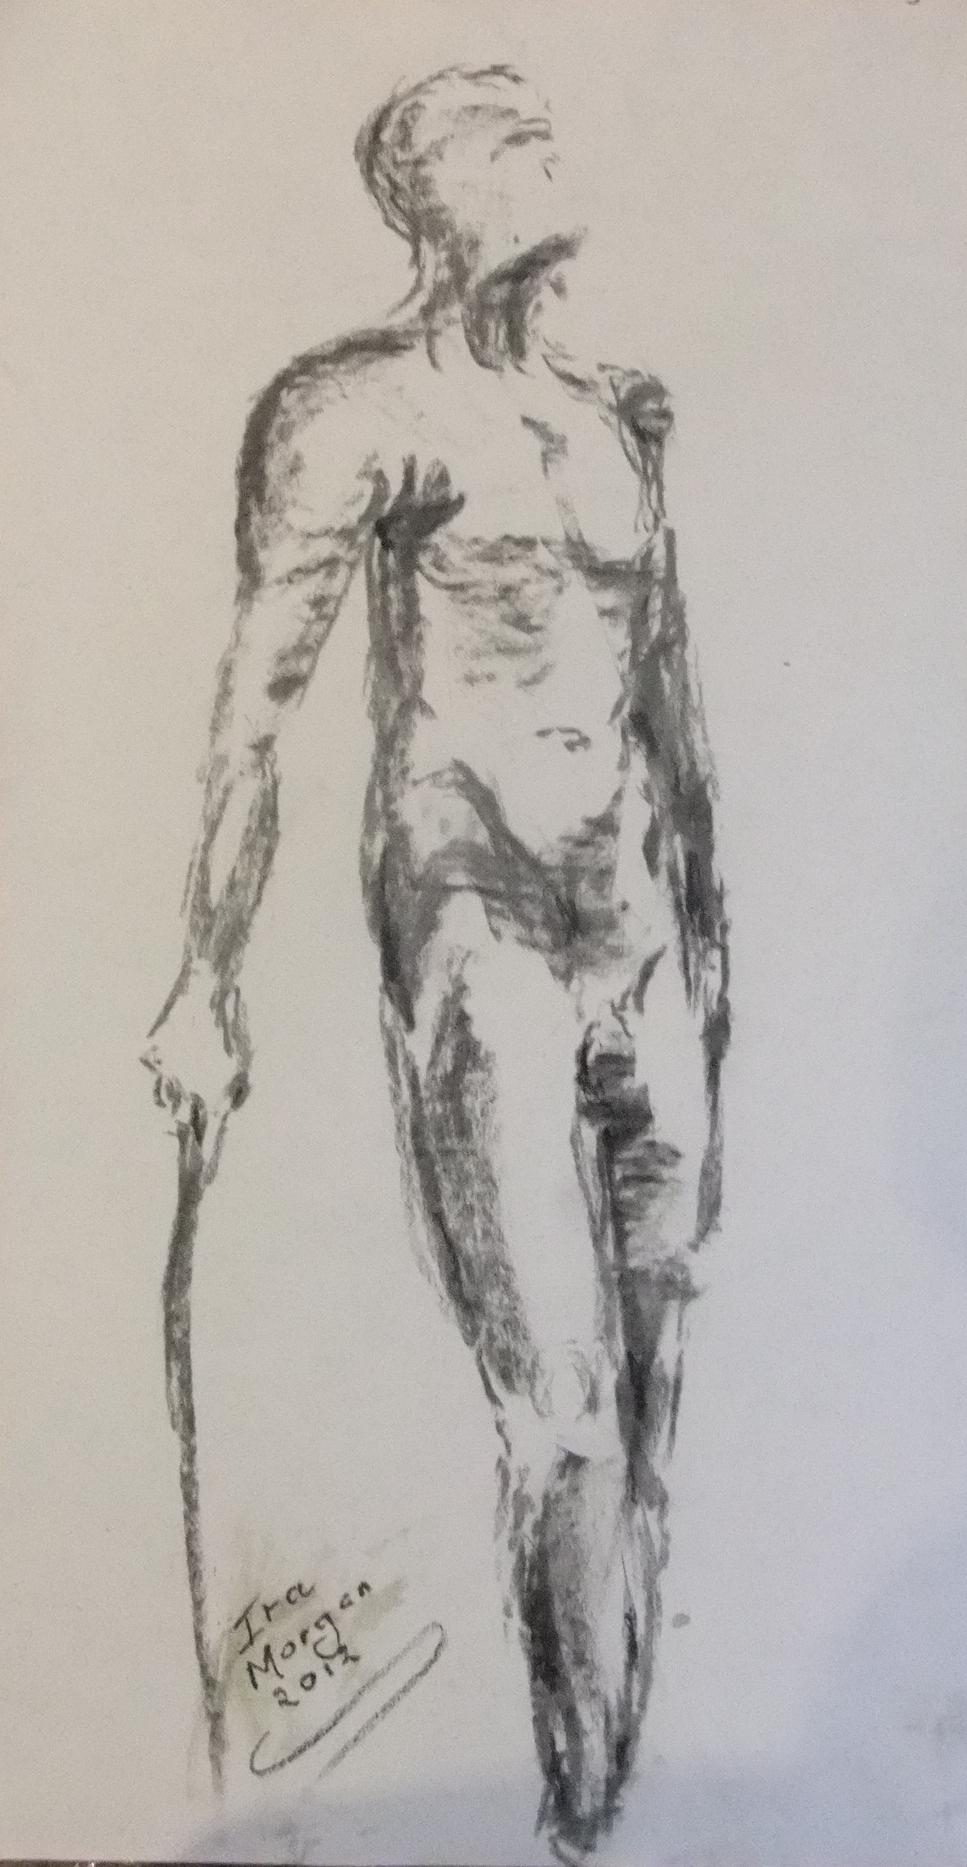 158. ' Charcoal Man'